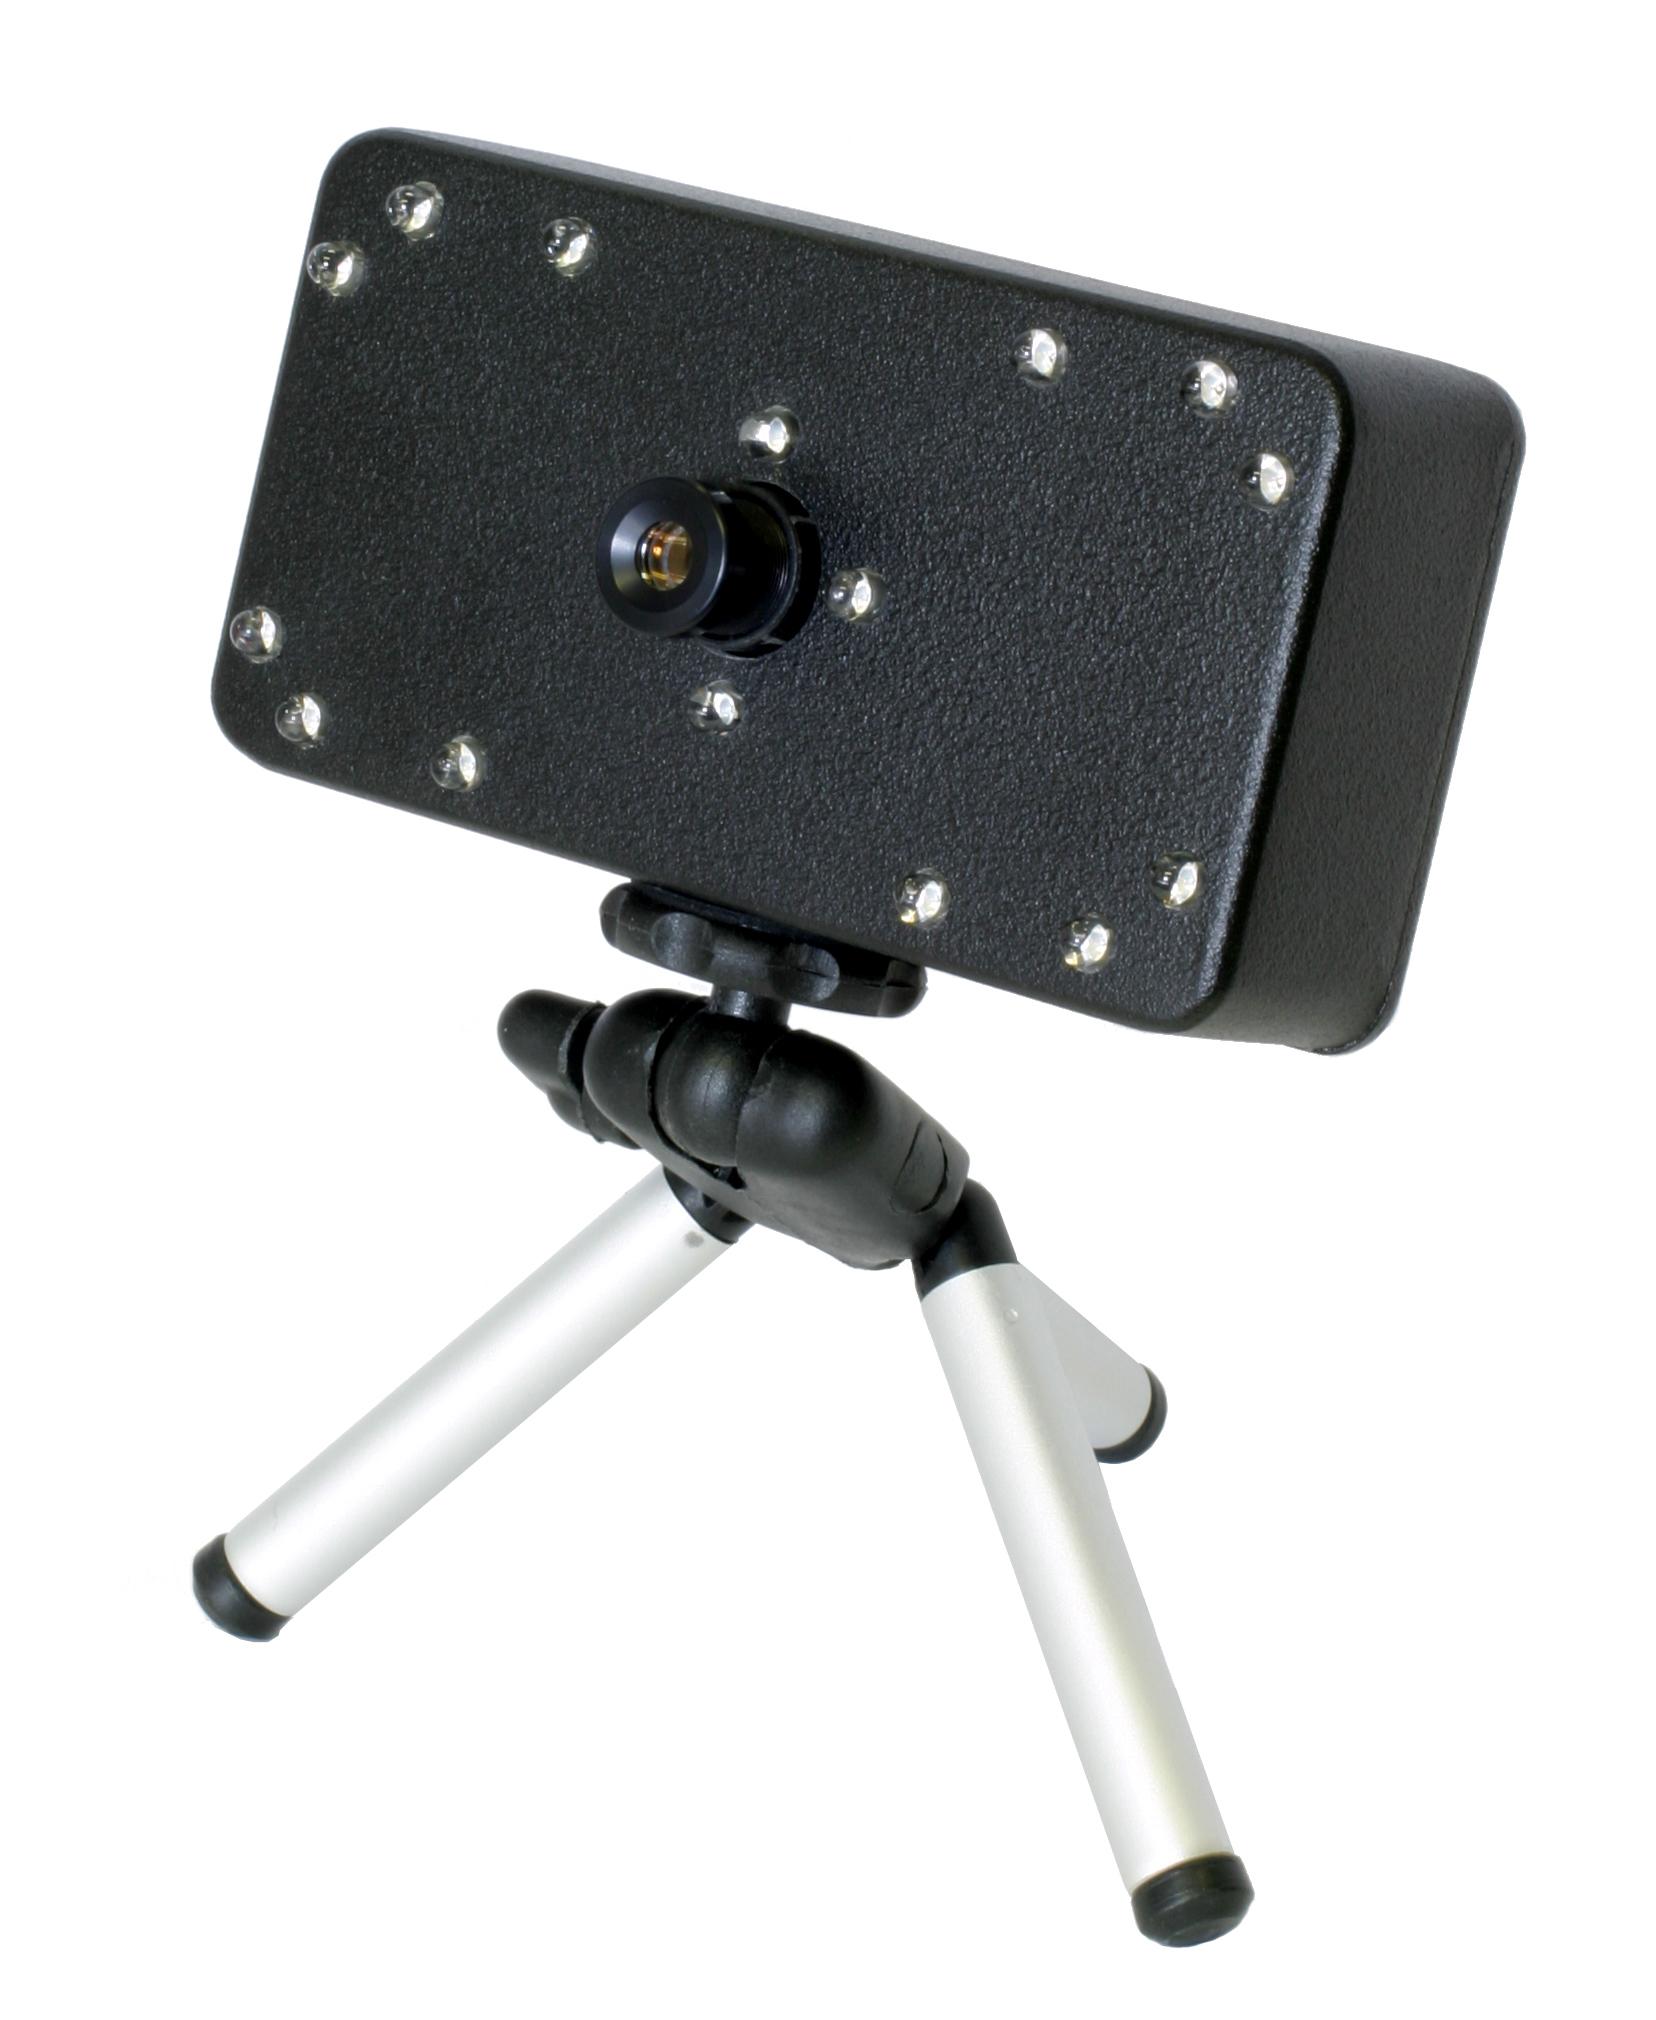 eyebox1 (2004) first eye contact sensor